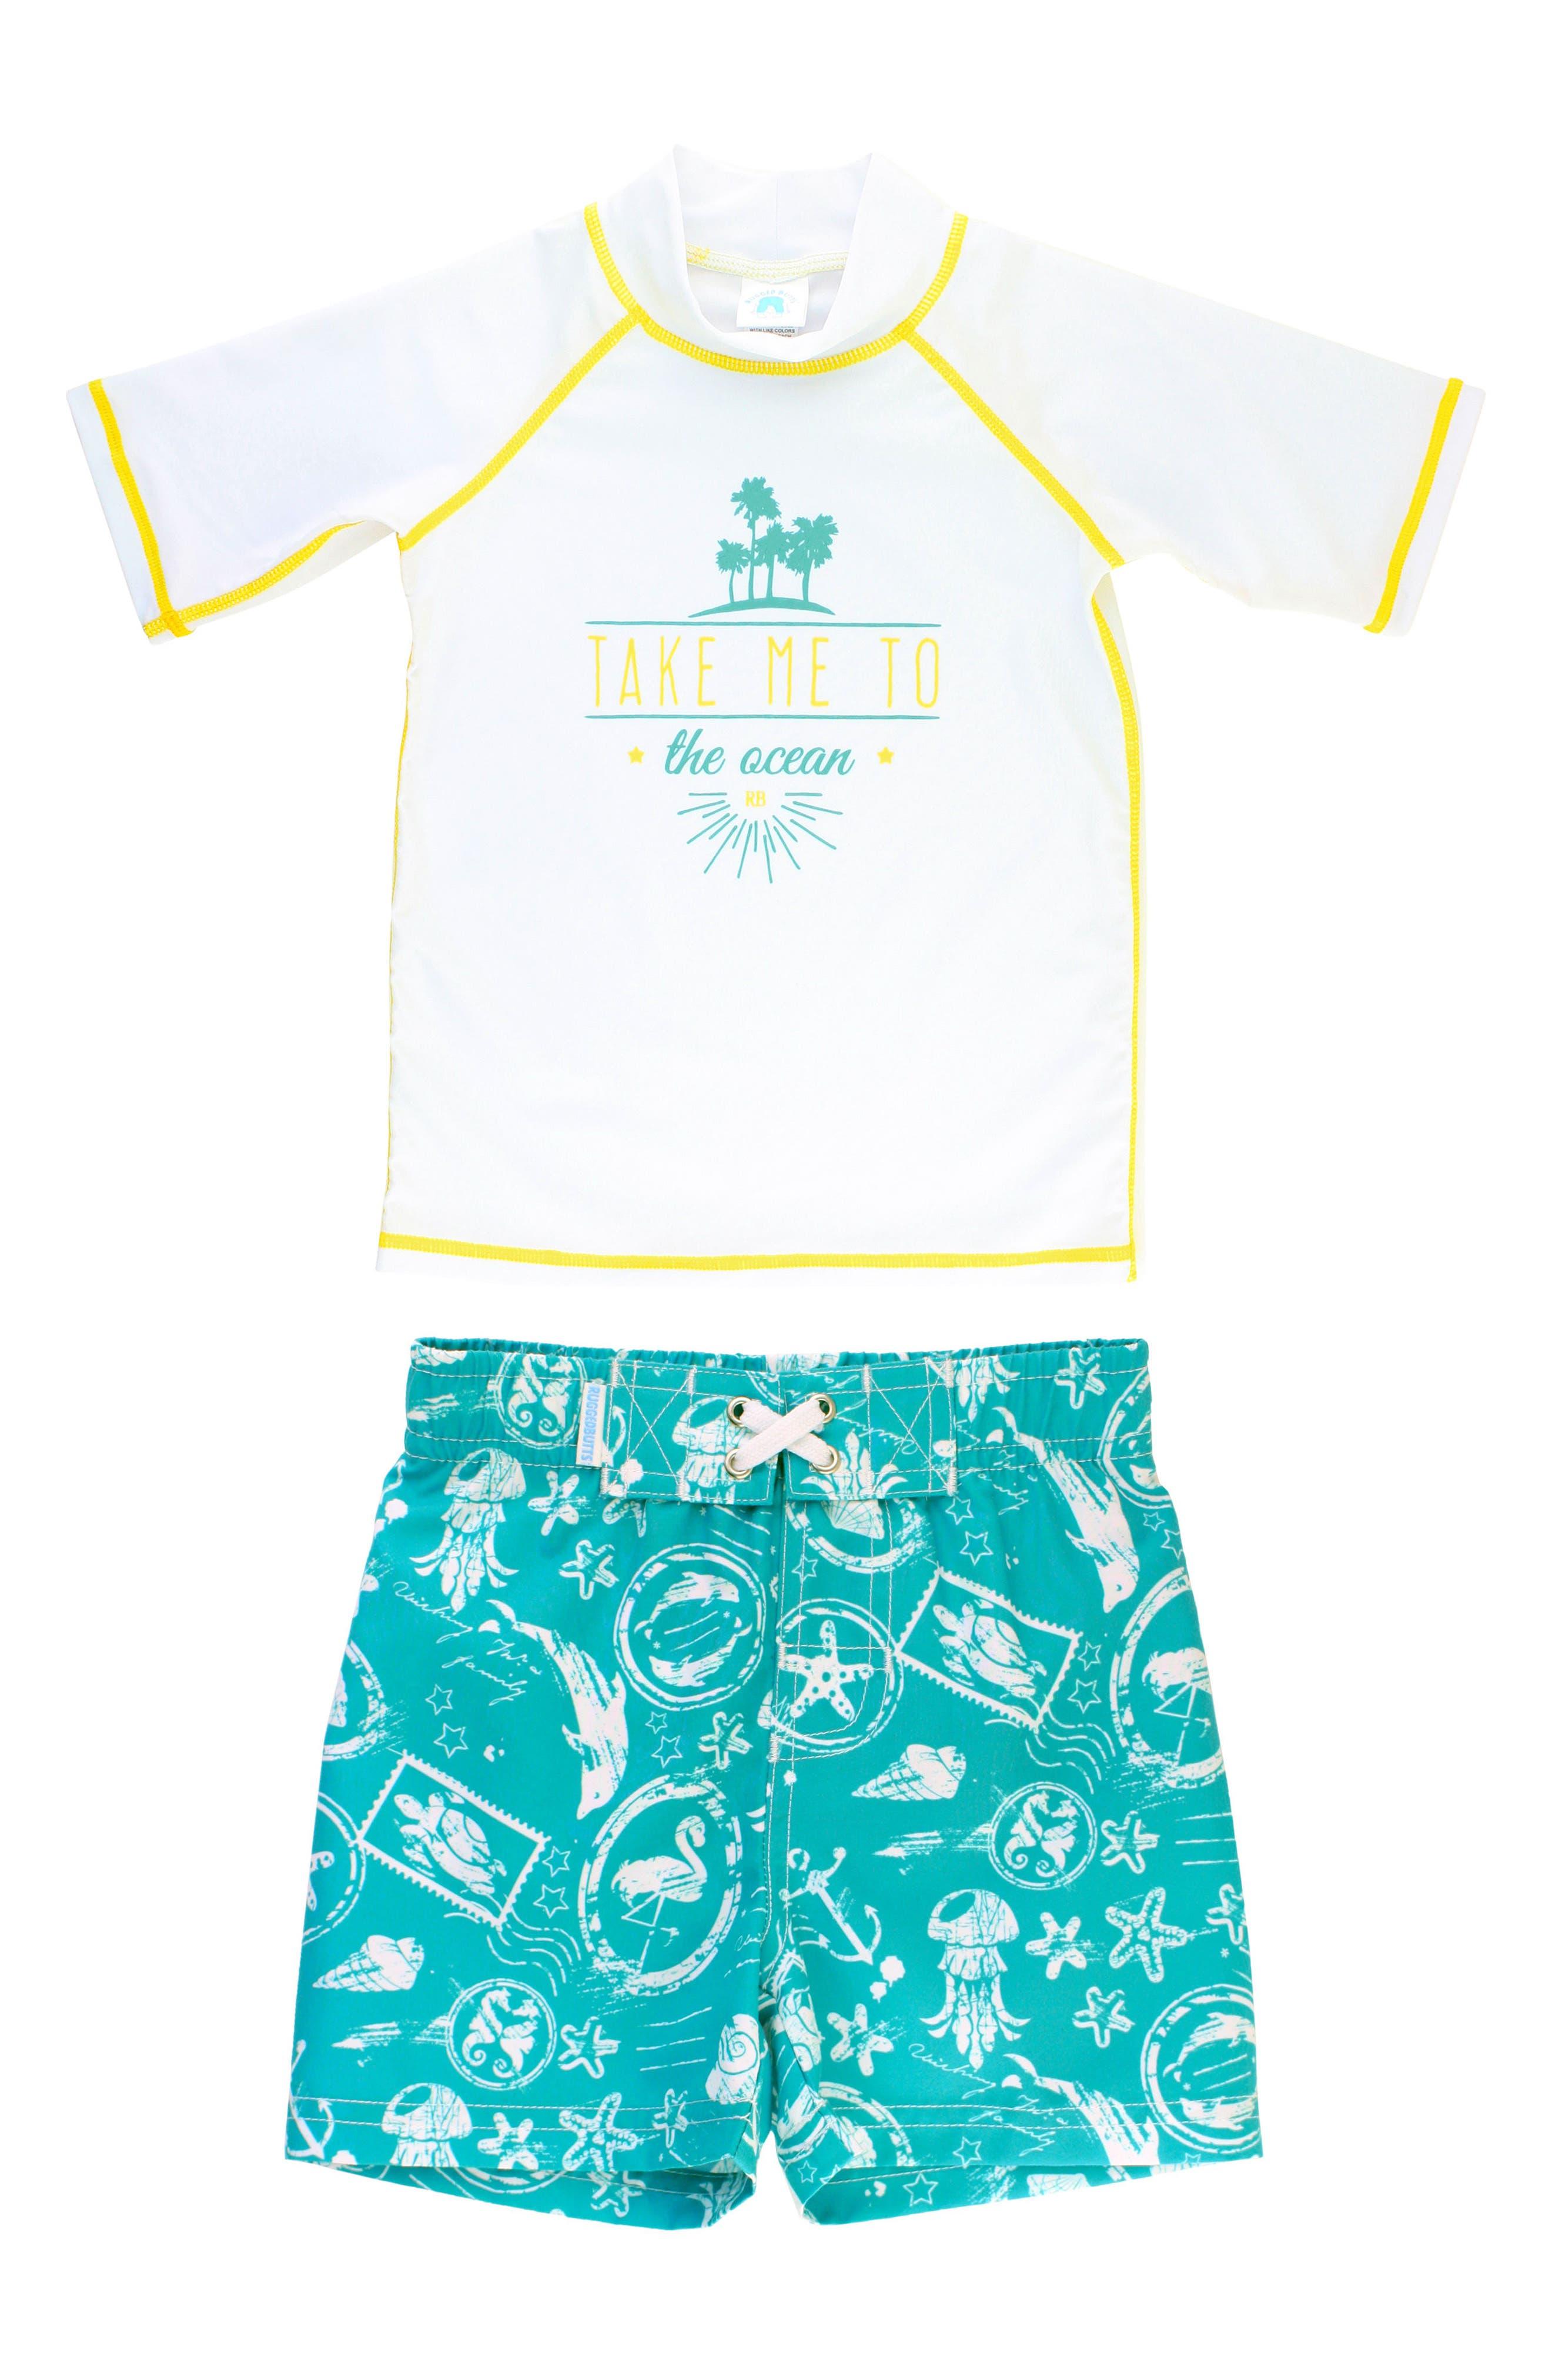 Alternate Image 1 Selected - RuggedButts Take Me to the Ocean Rashguard & Board Shorts Set (Toddler Boys & Little Boys)